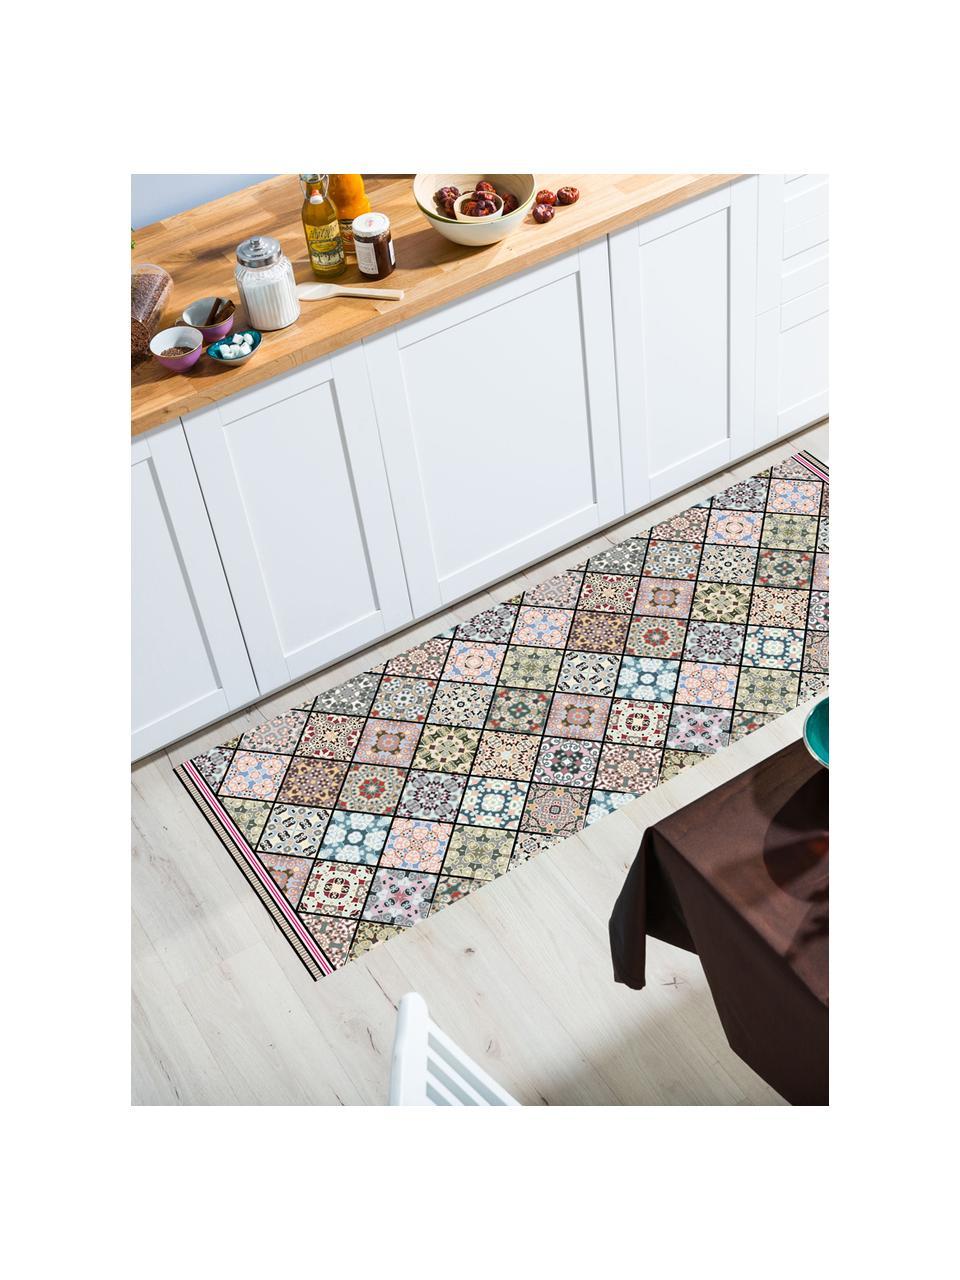 Vlakke vinyl vloermat Aylin met kleurrijke print, antislip, Recyclebaar vinyl, Multicolour, 65 x 255 cm